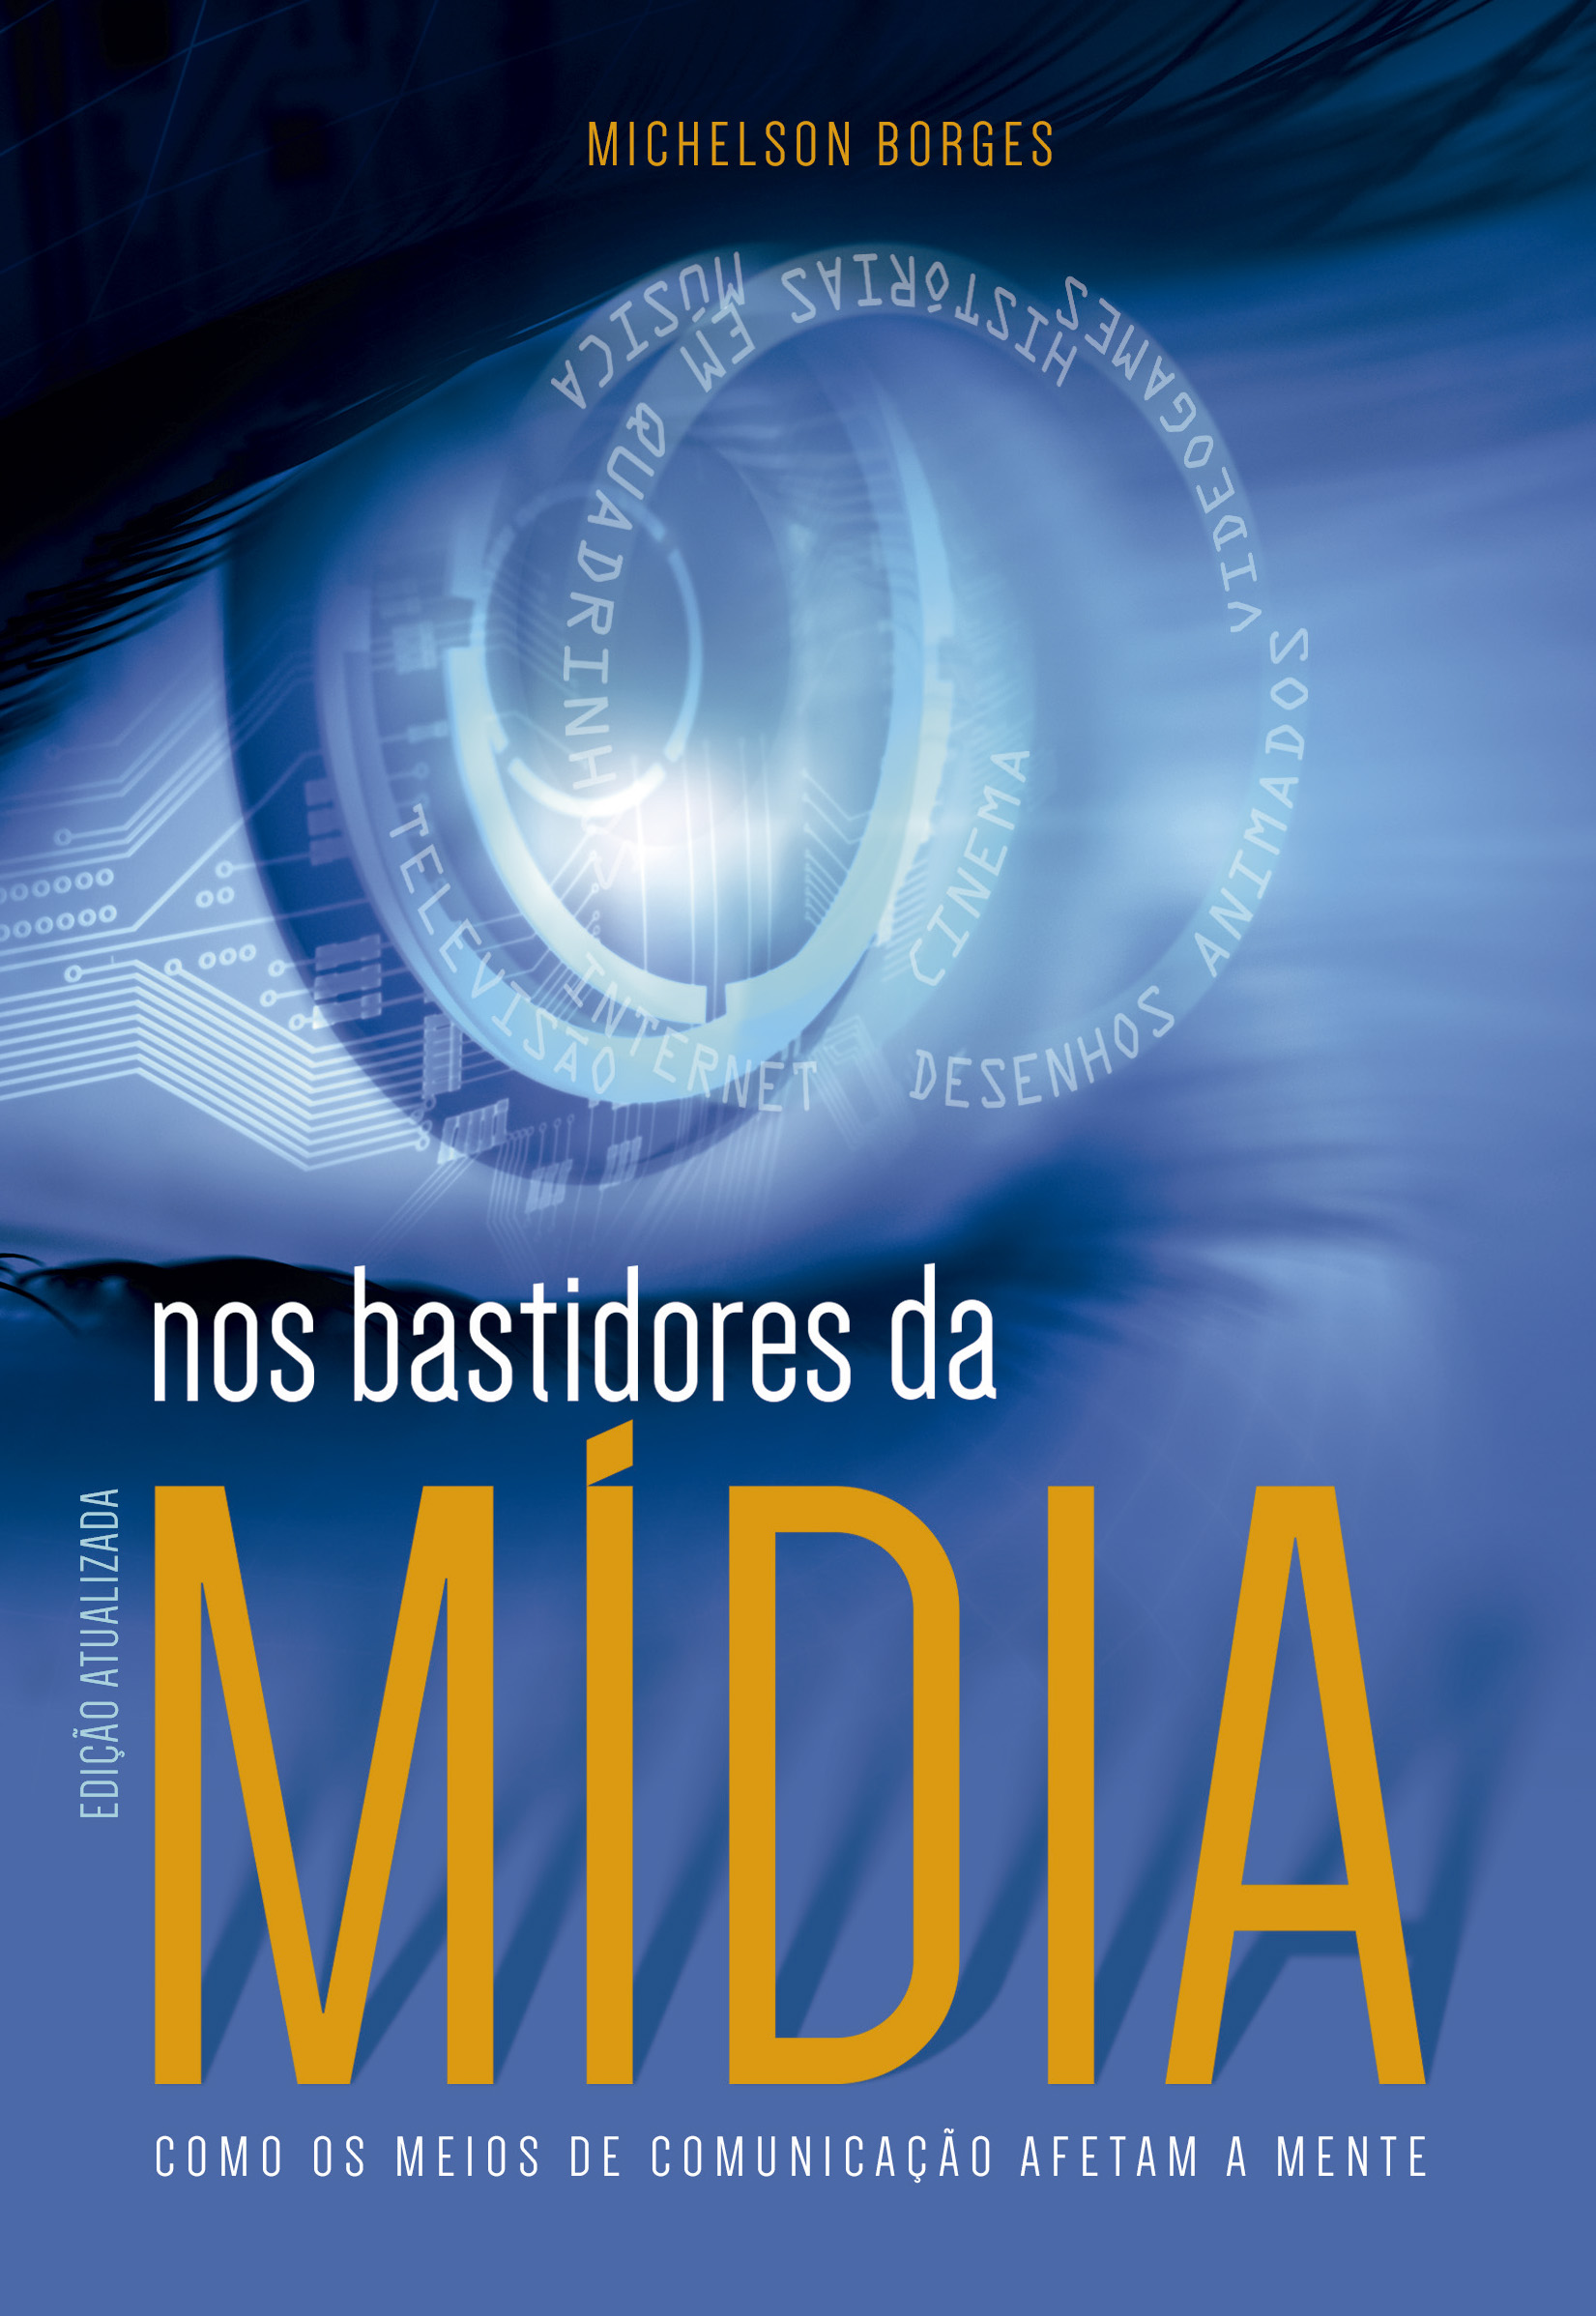 Autor da obra é jornalista e atual editor da revista Vida de Saúde. Foto: Gentileza da Casa Publicadora Brasileira